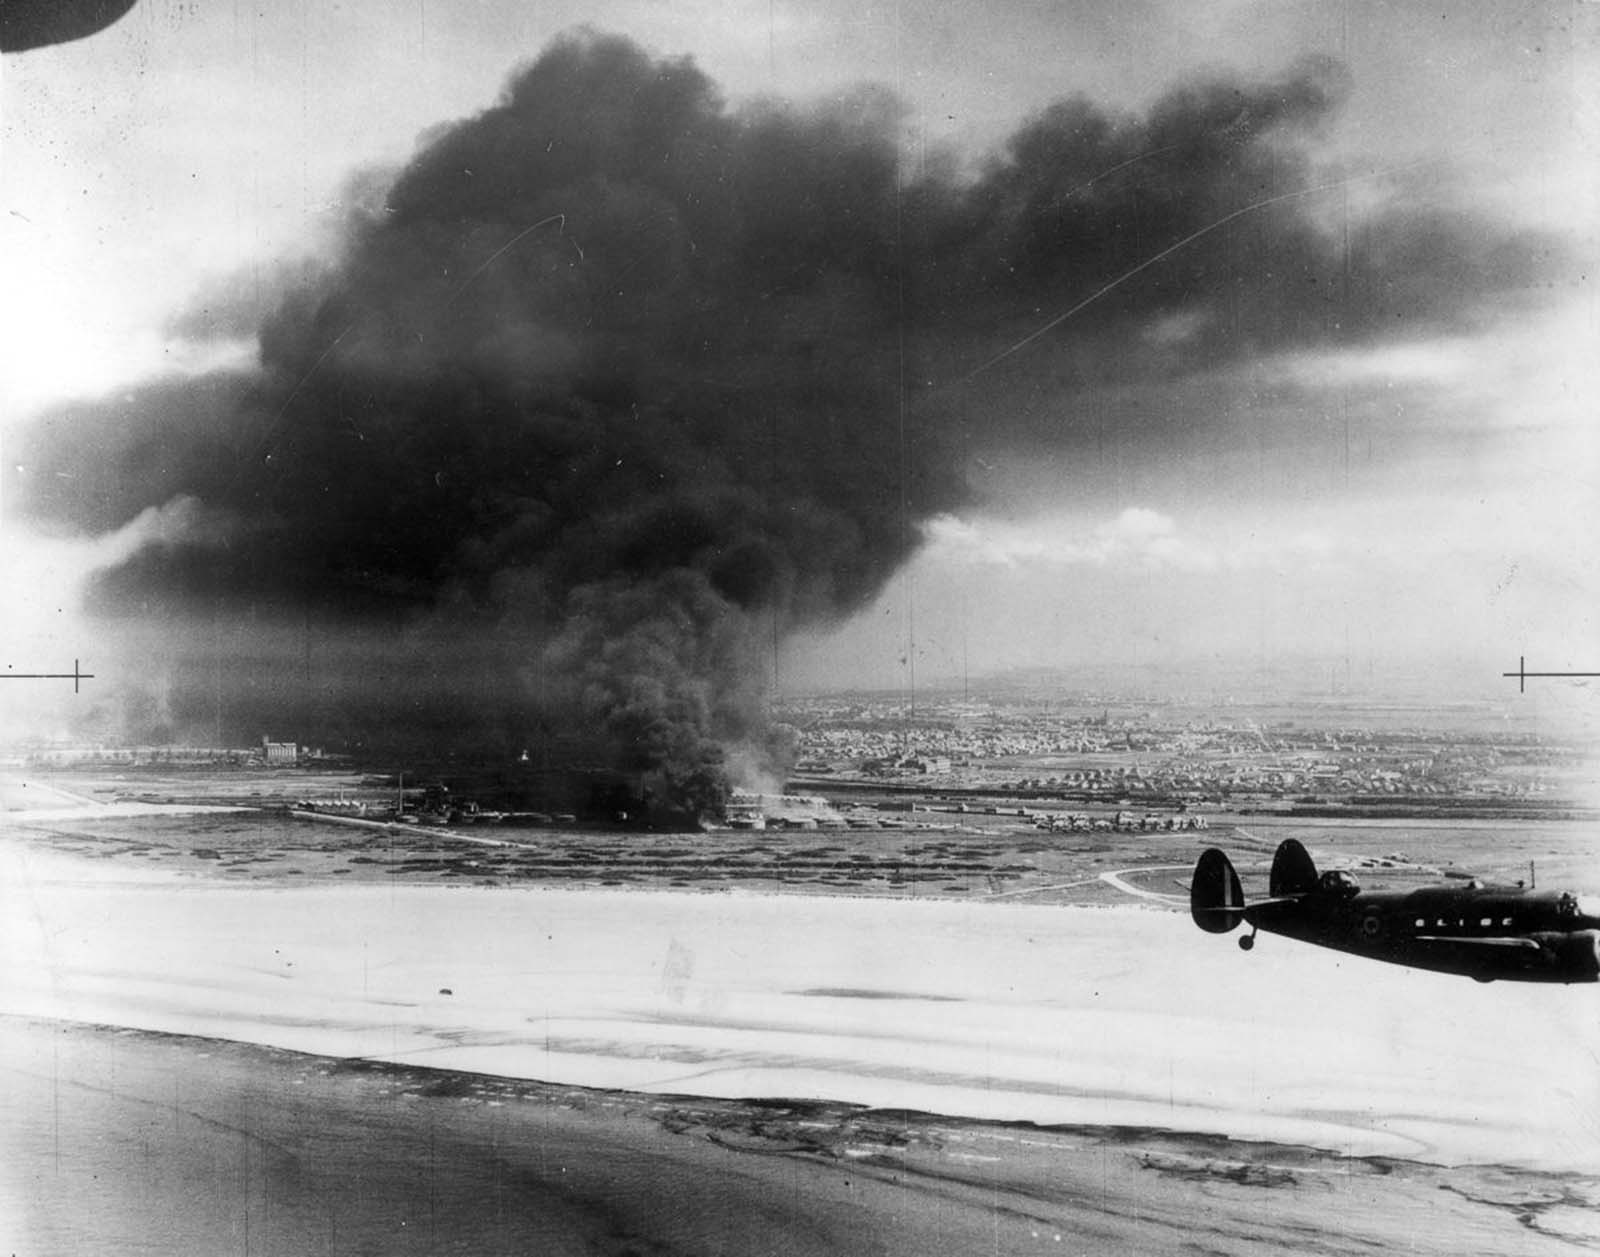 Oil tanks burn on Dunkirk beach.